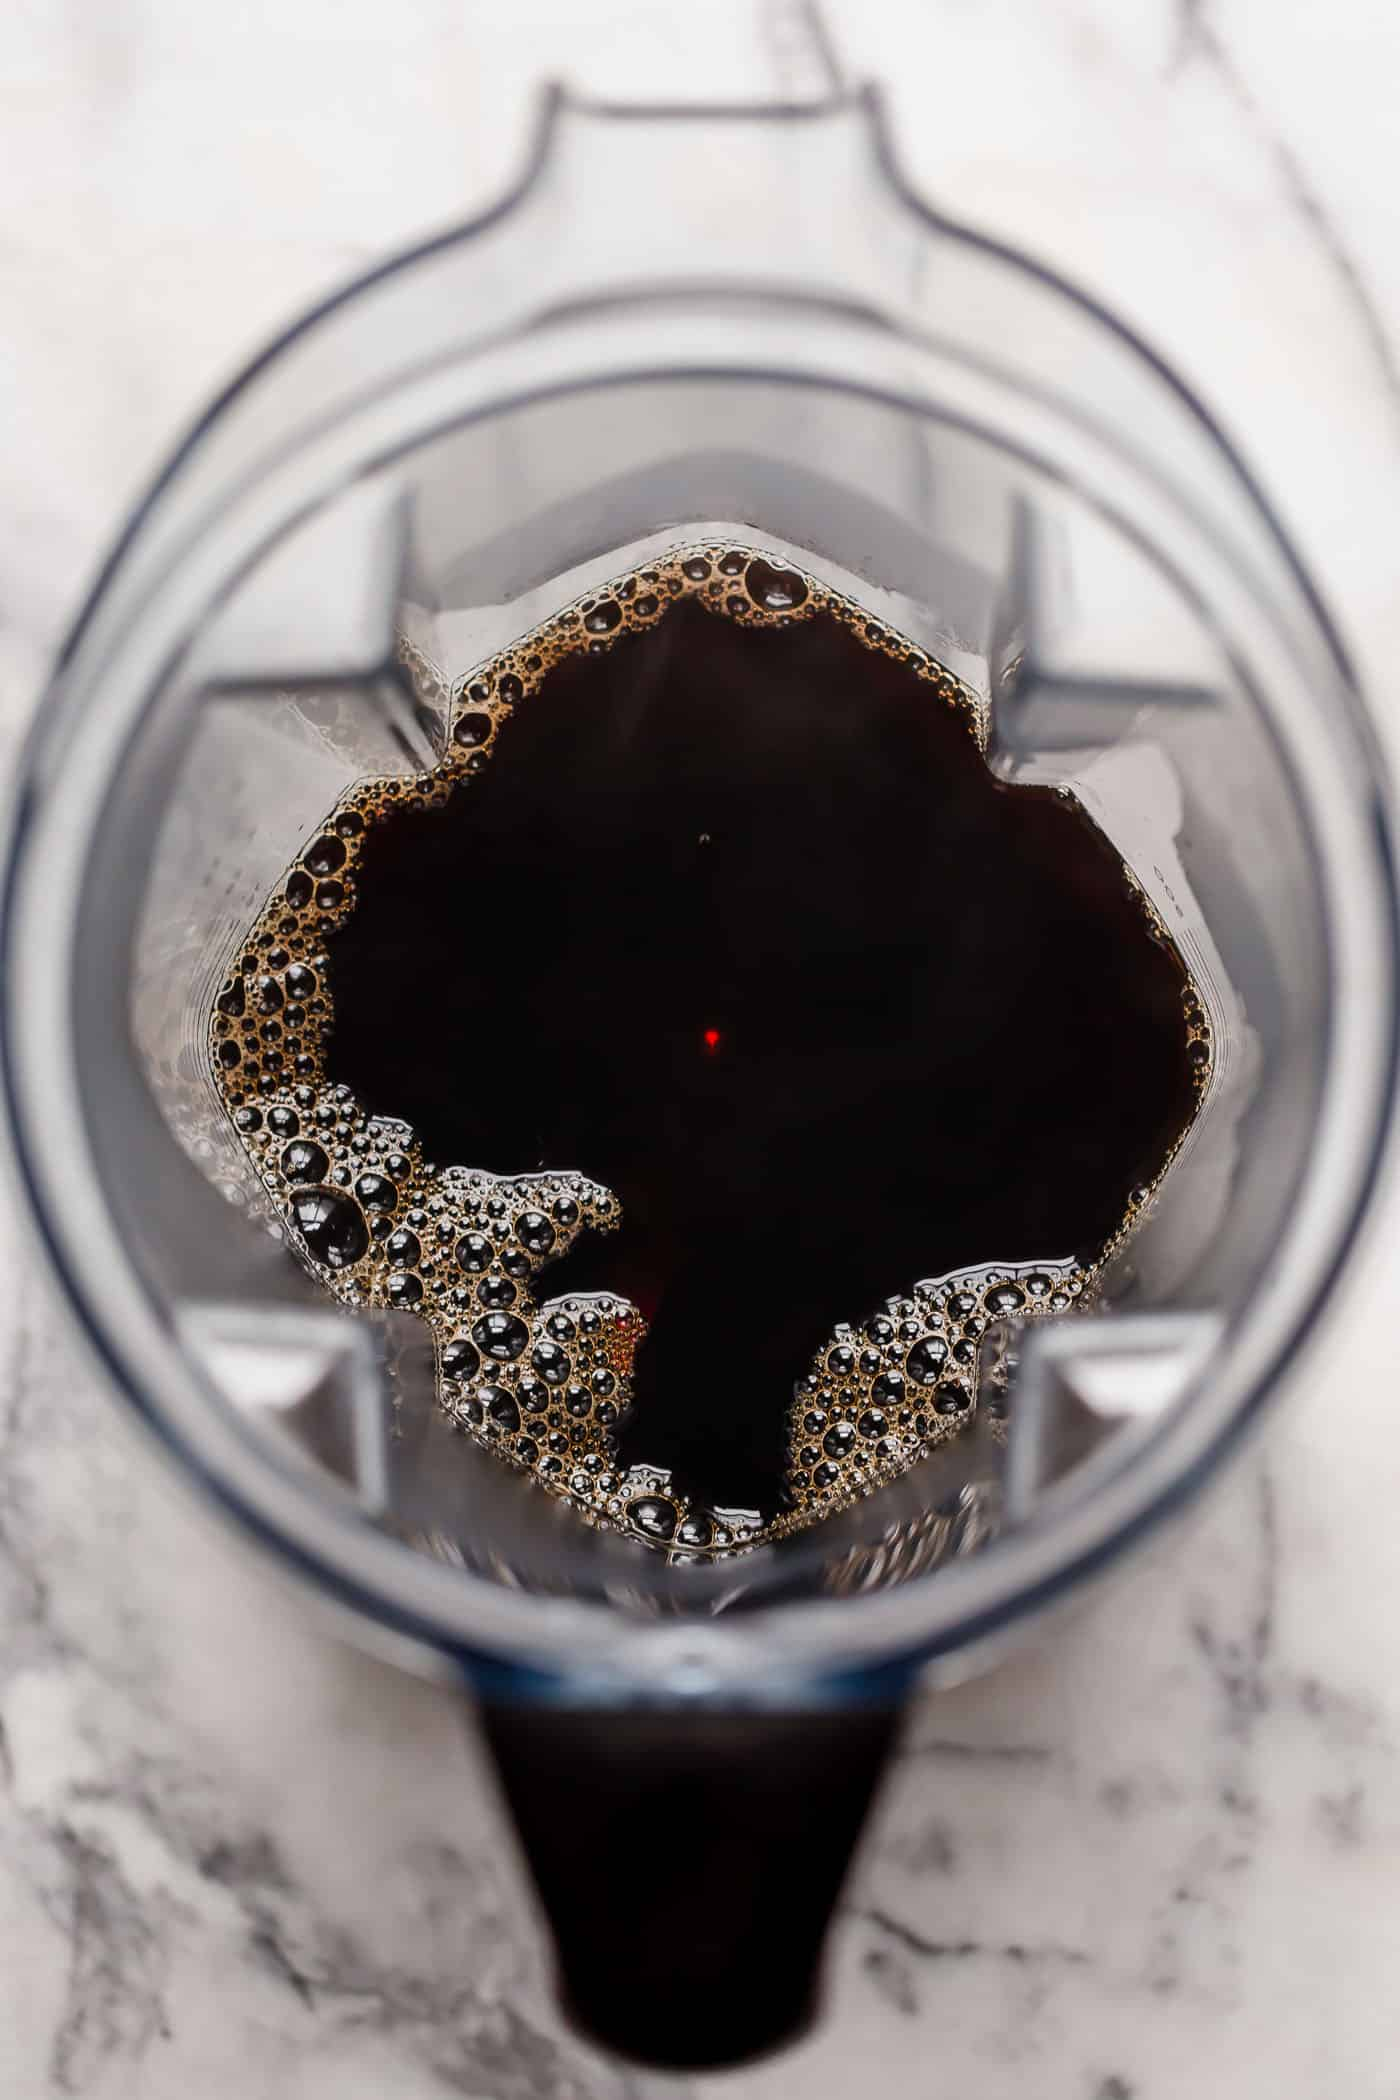 hot black coffee in a blender